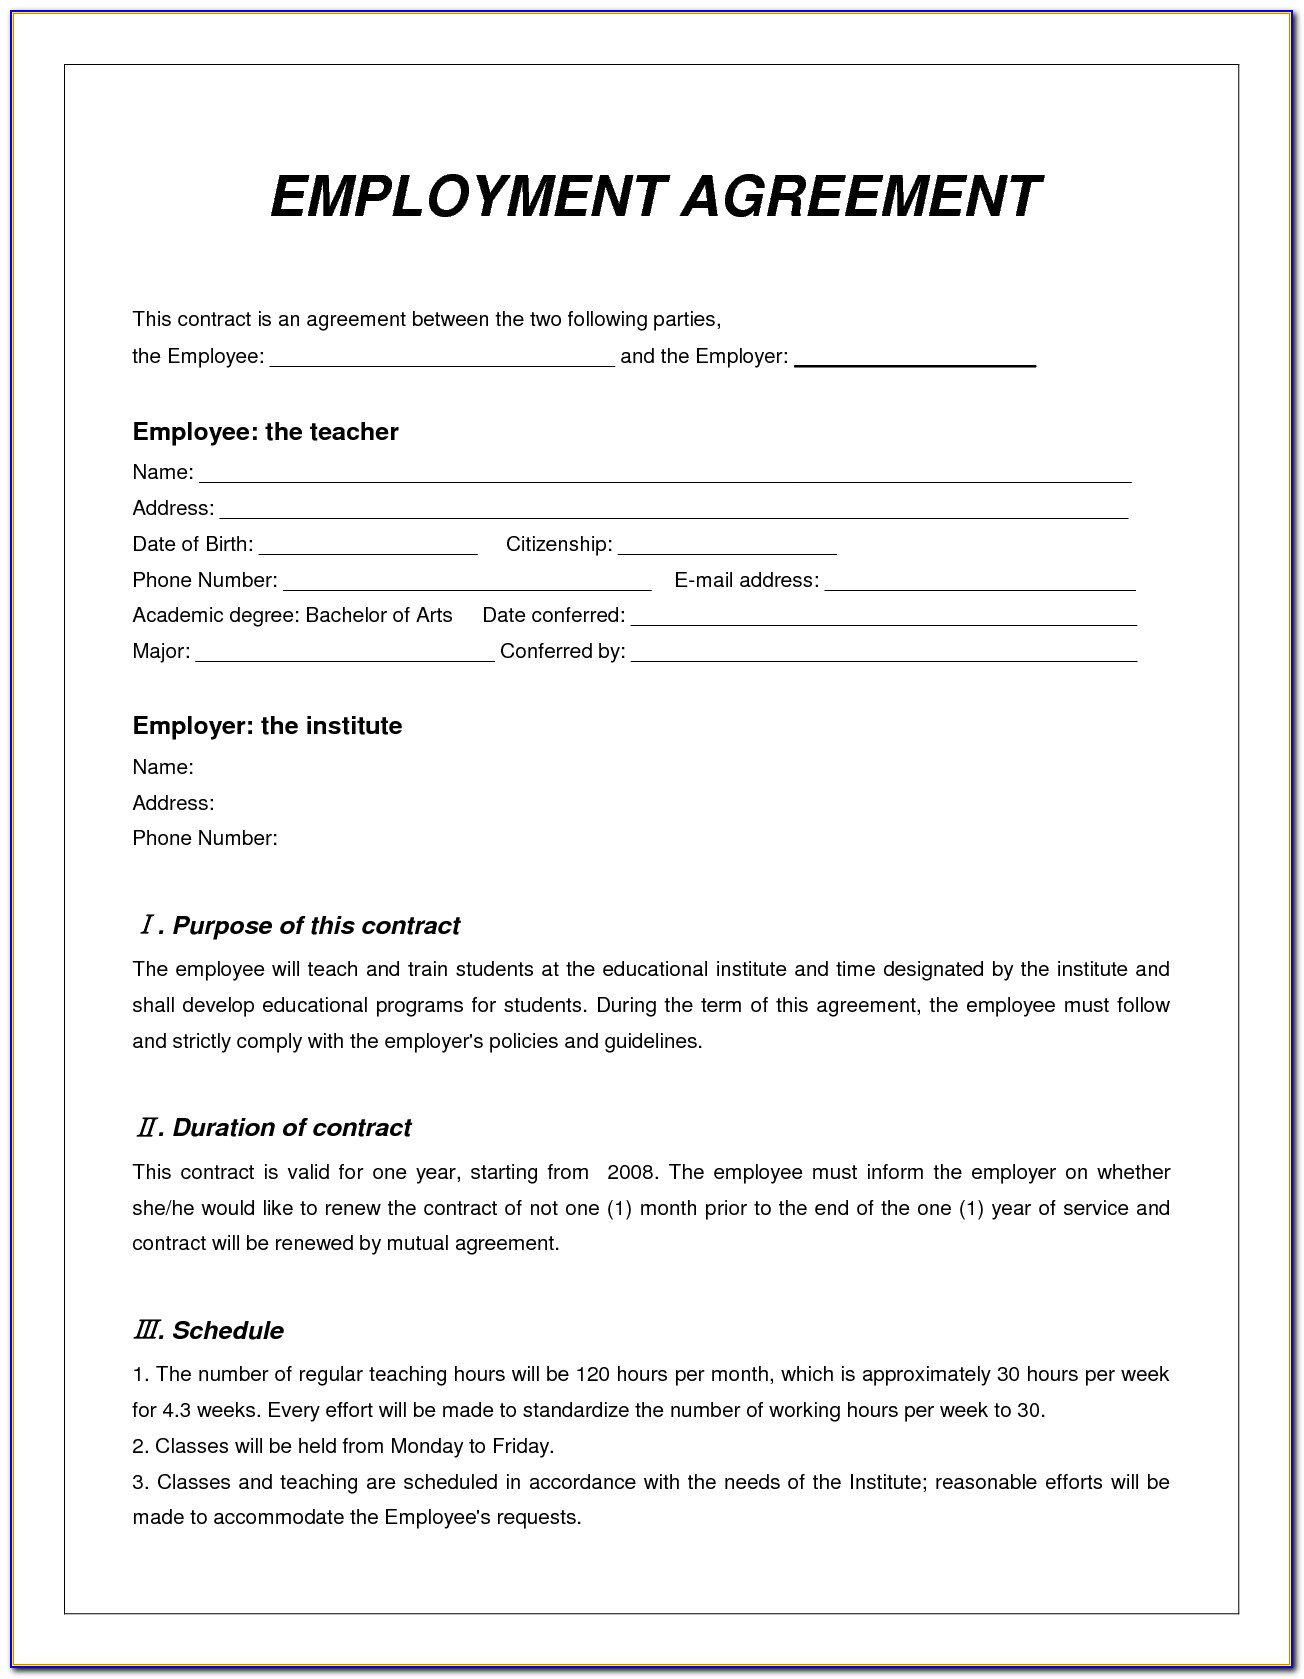 Employee Agreement Templates